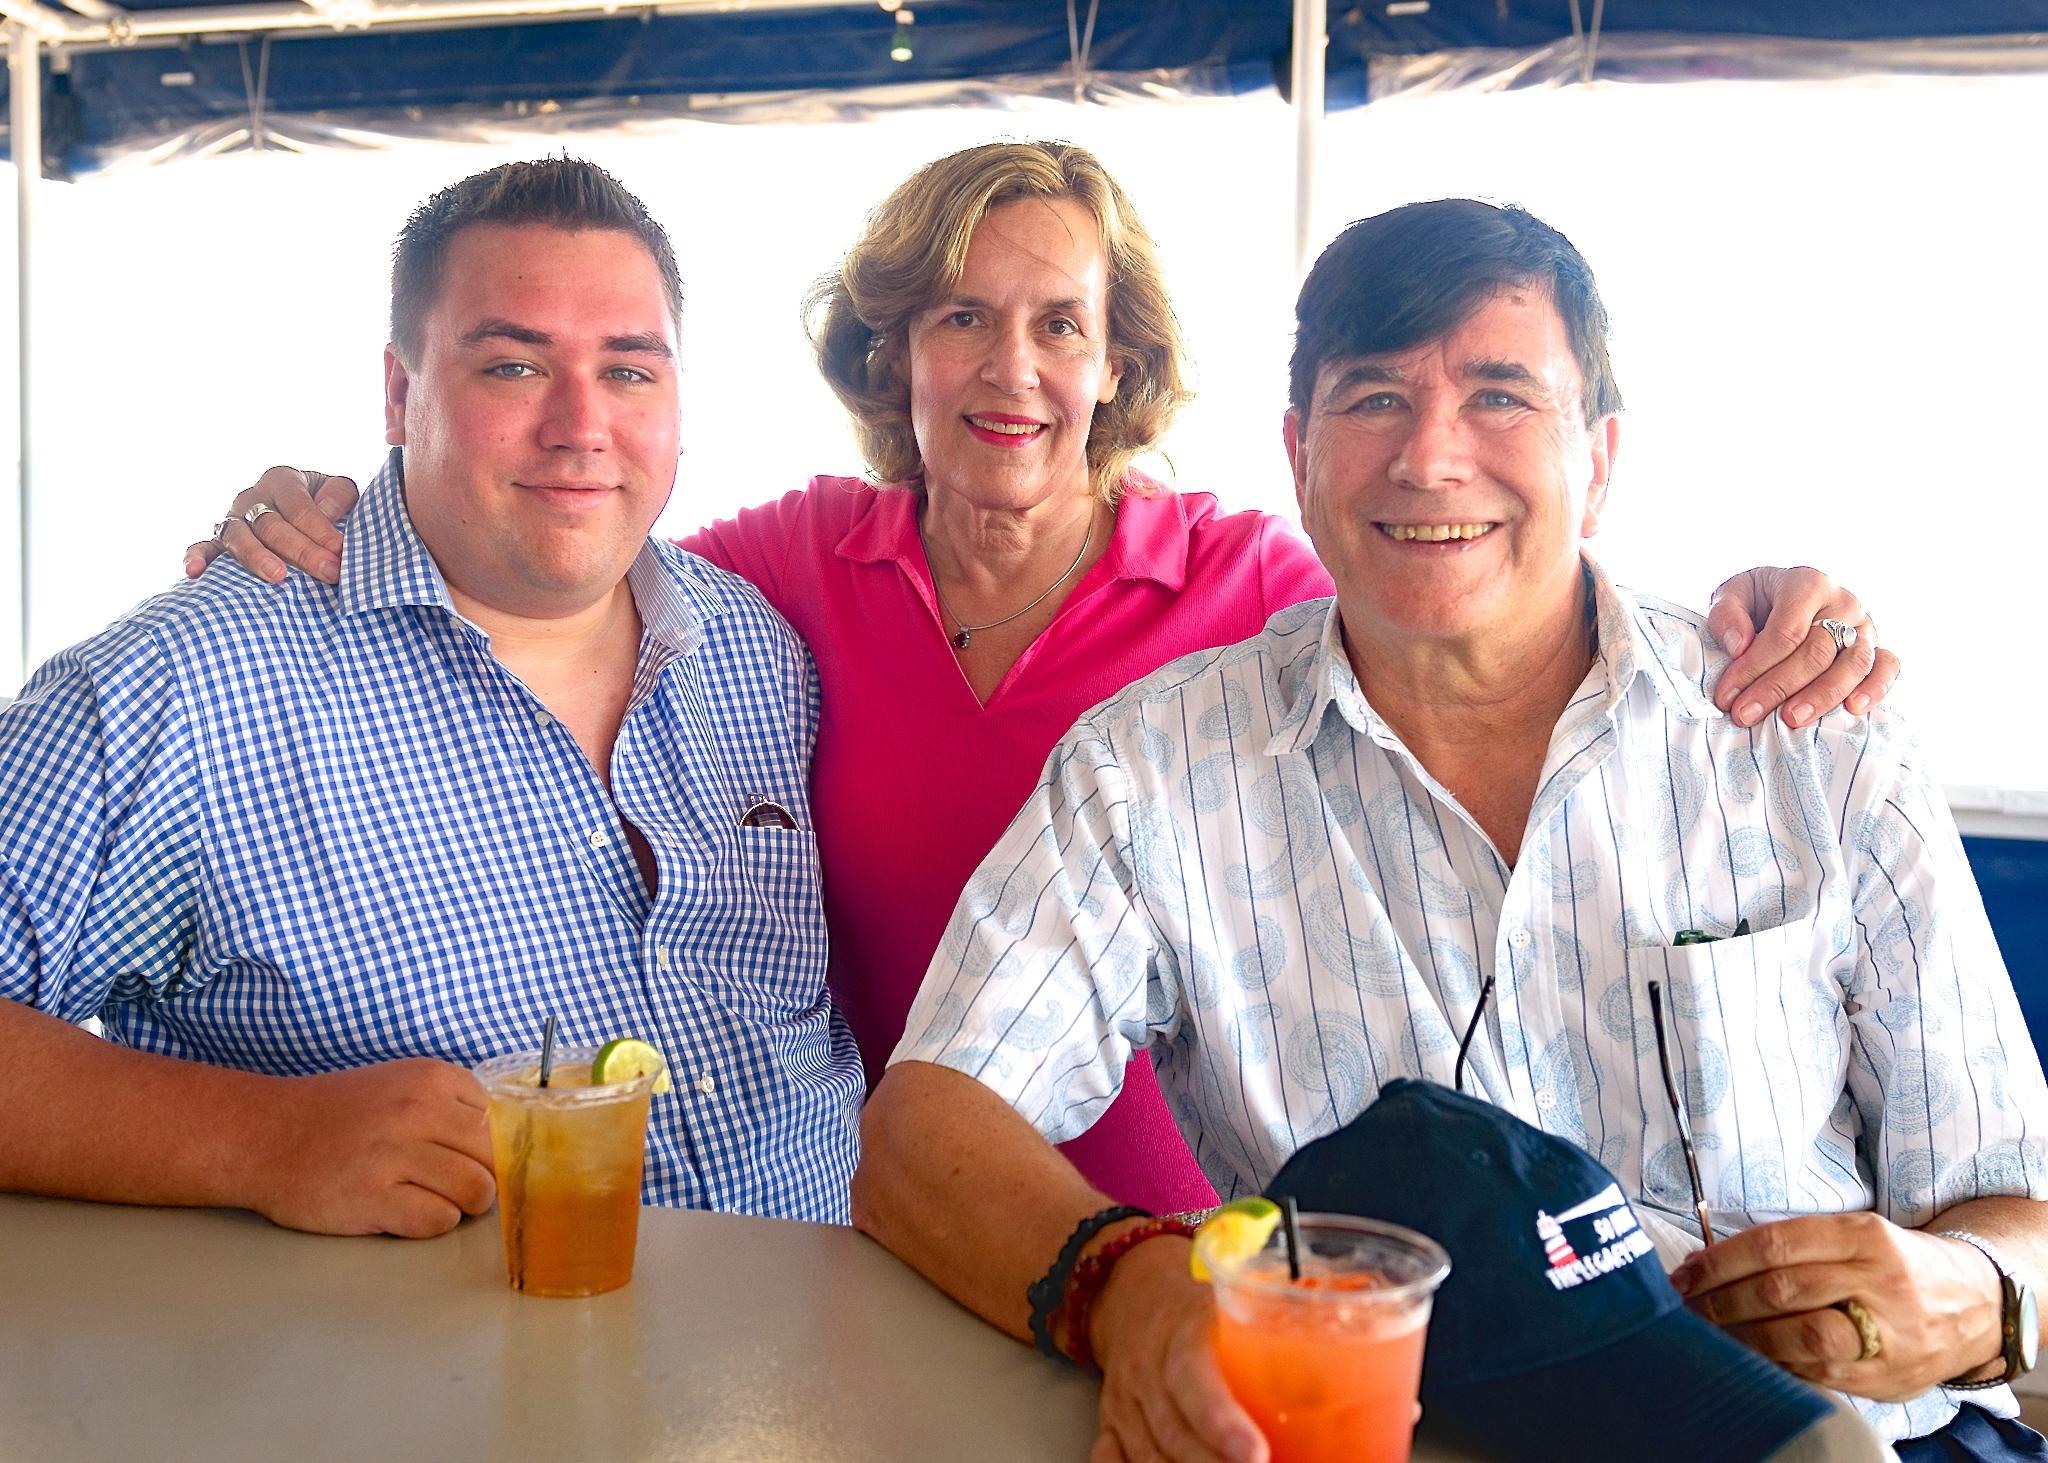 Greg Wagner, Lorraine Gudas, & John Wagner